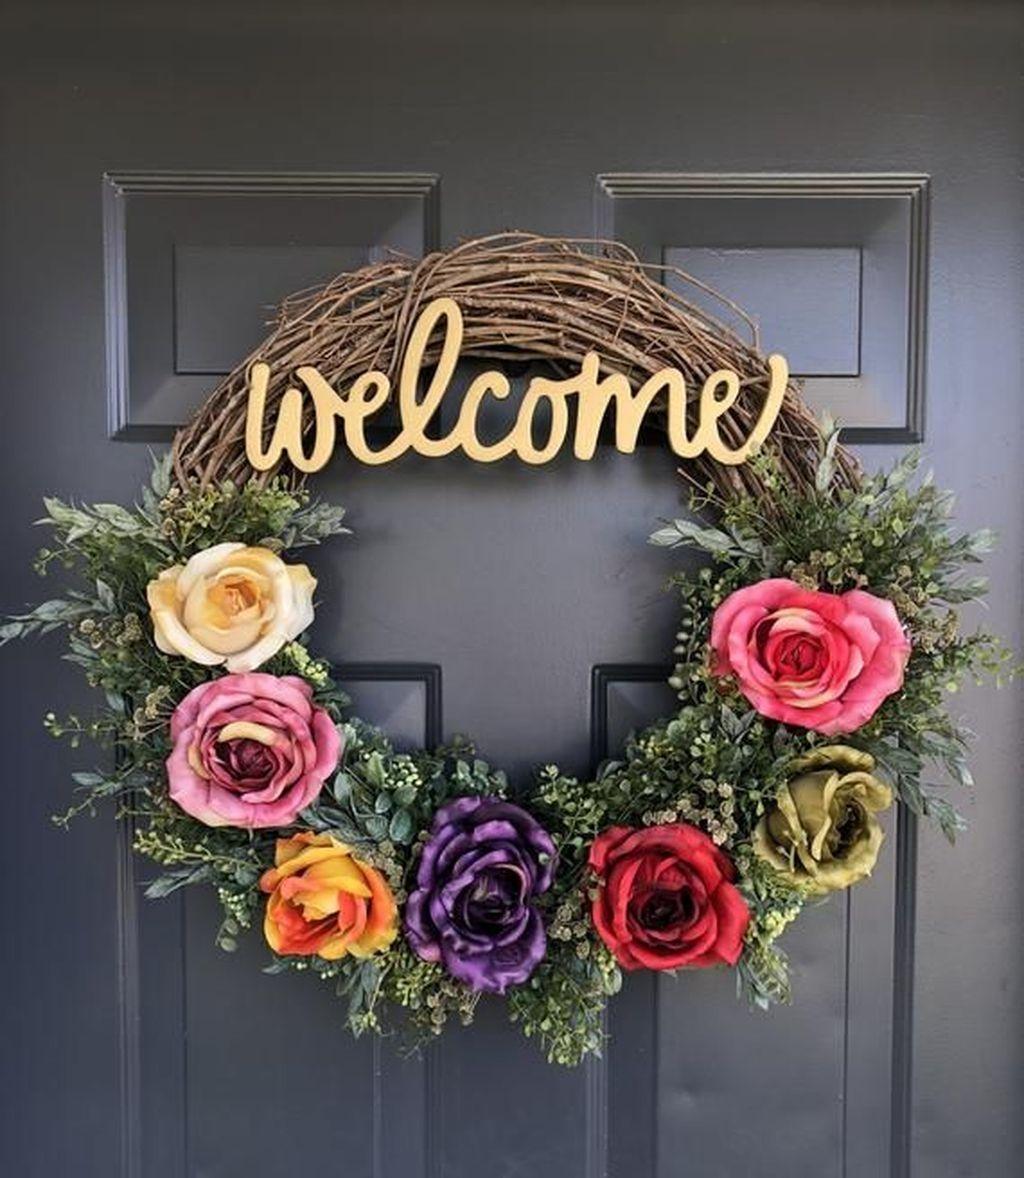 20 Beautiful Summer Wreath Design Ideas To Try Asap Coodecor Spring Floral Wreath Spring Flower Wreath Diy Spring Wreath